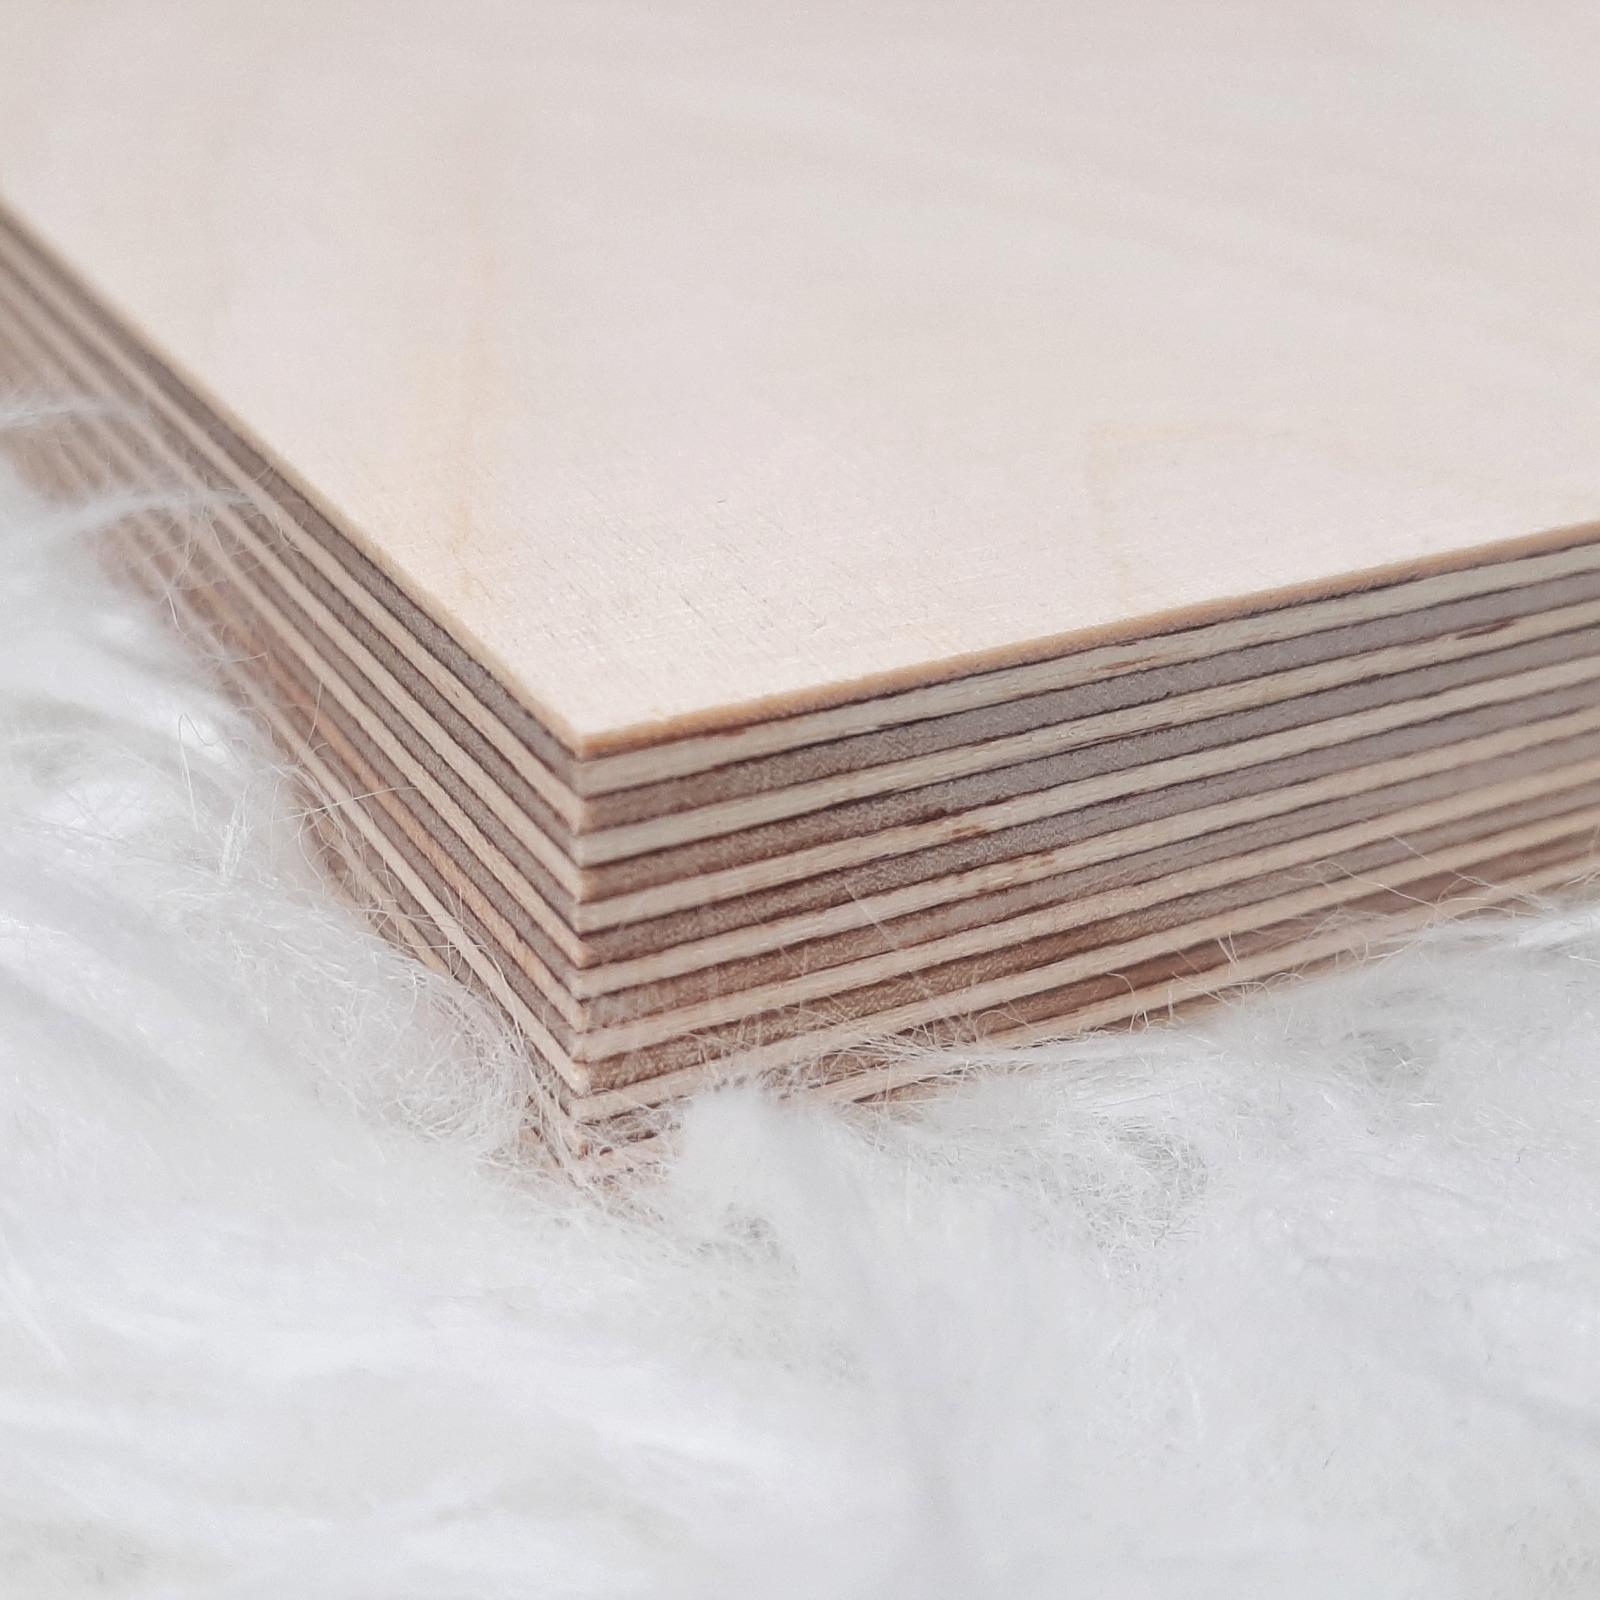 Koordinaten Home Holz Bild 8